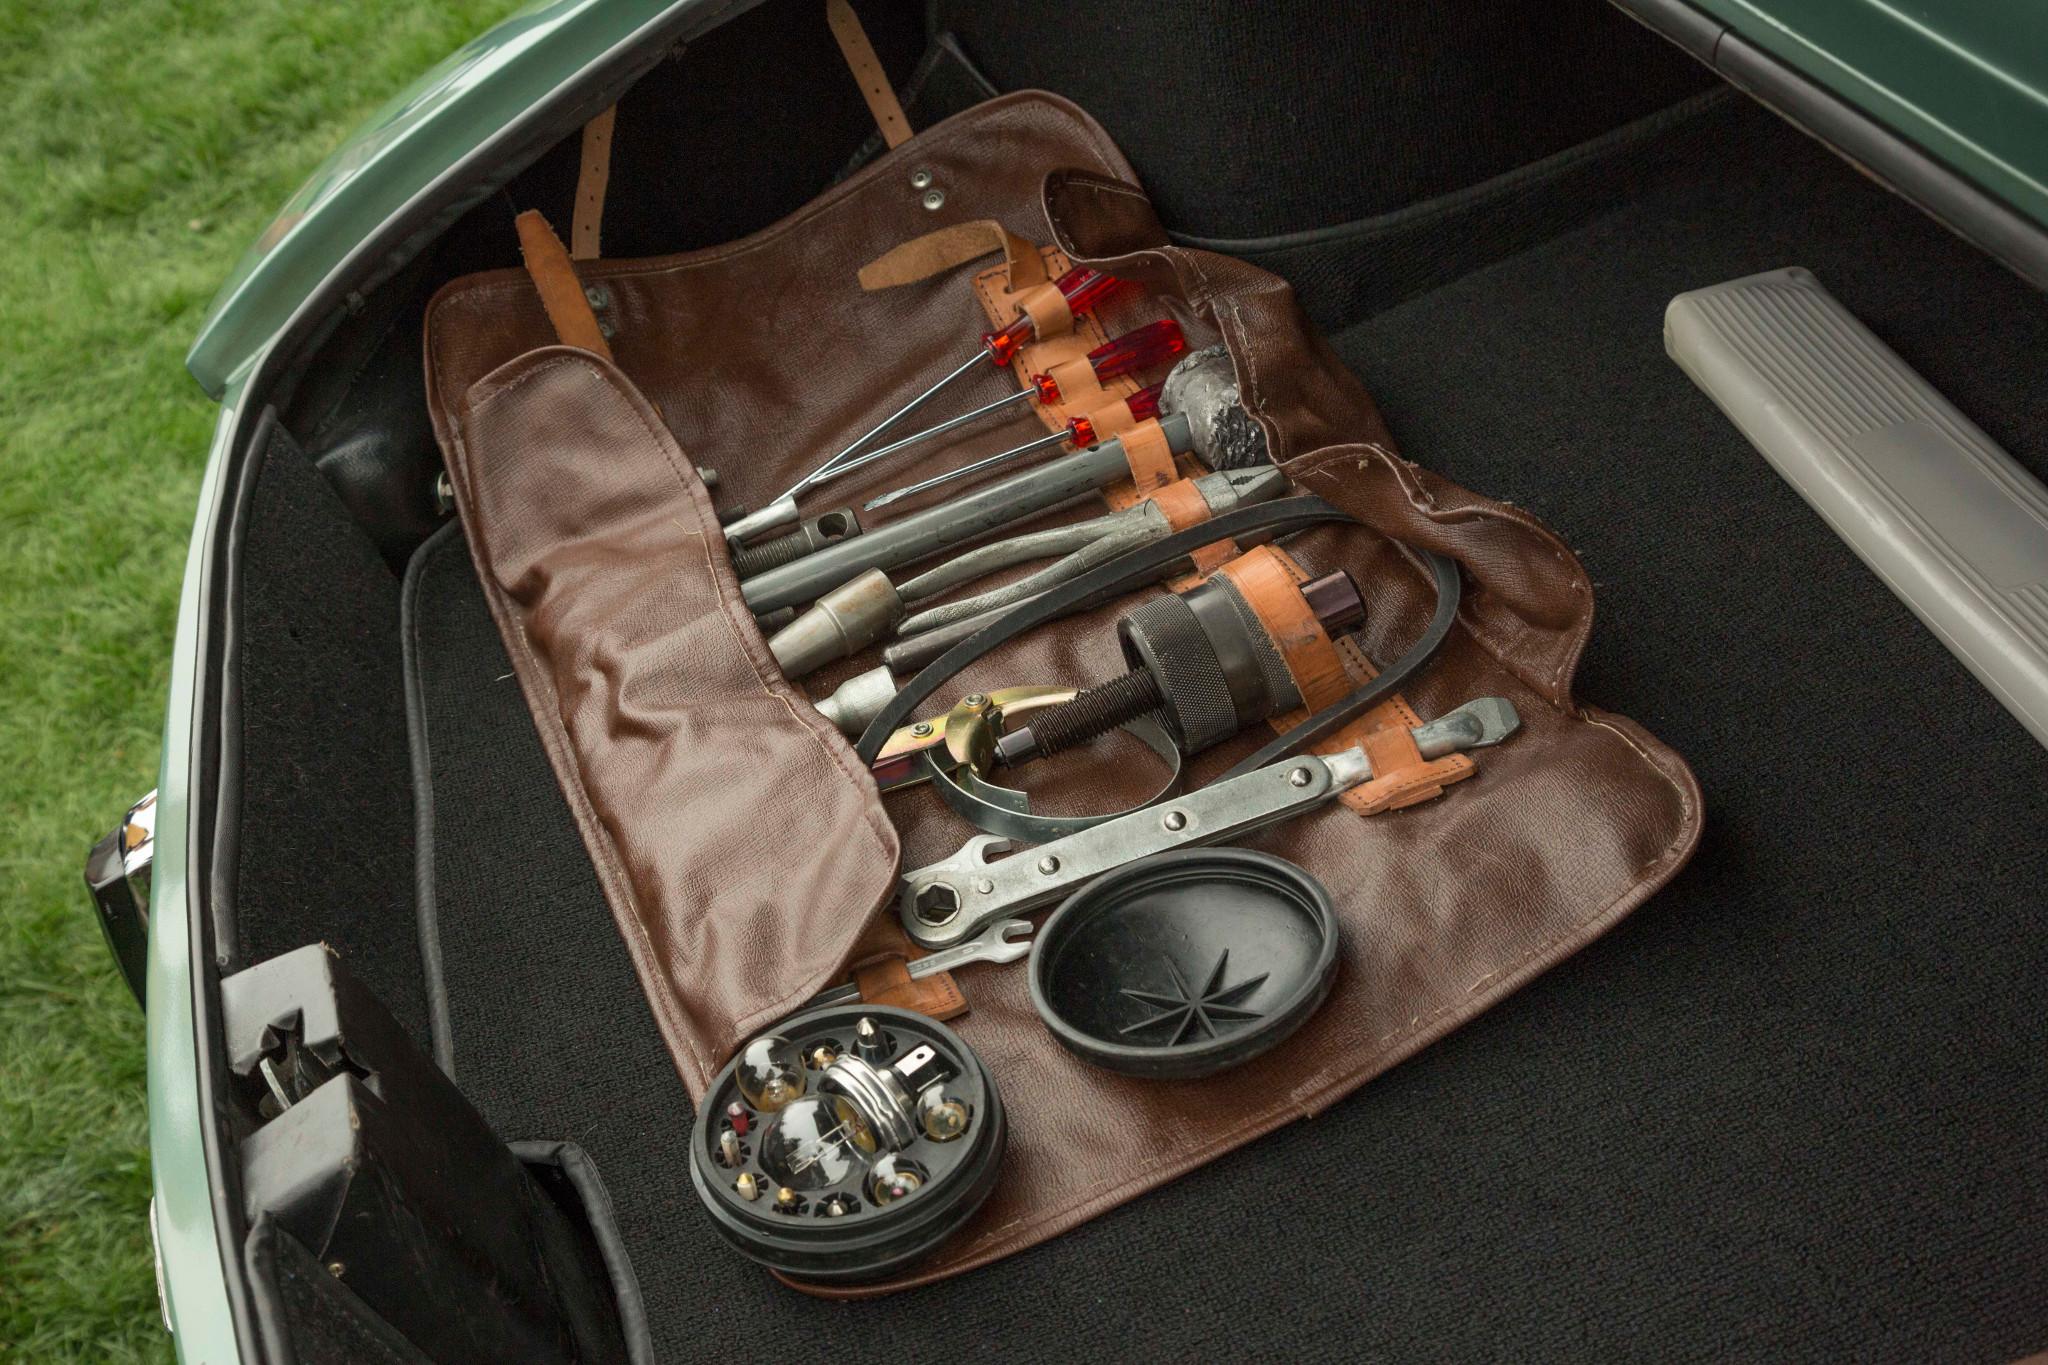 organized tool kit